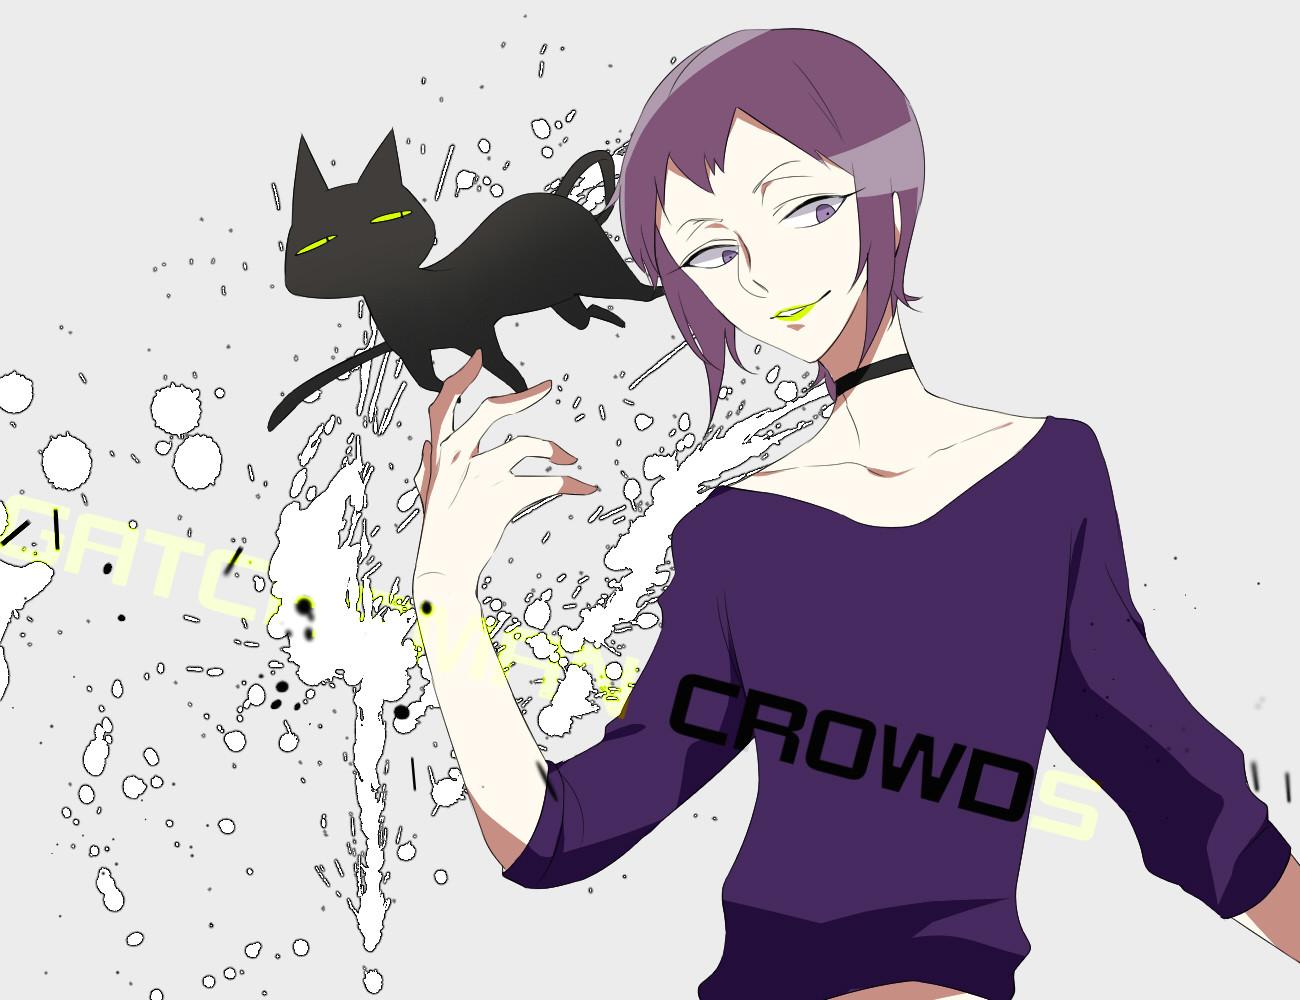 Anime Drawing Zerochan O D Gatchaman Crowds Zerochan Anime Image Board